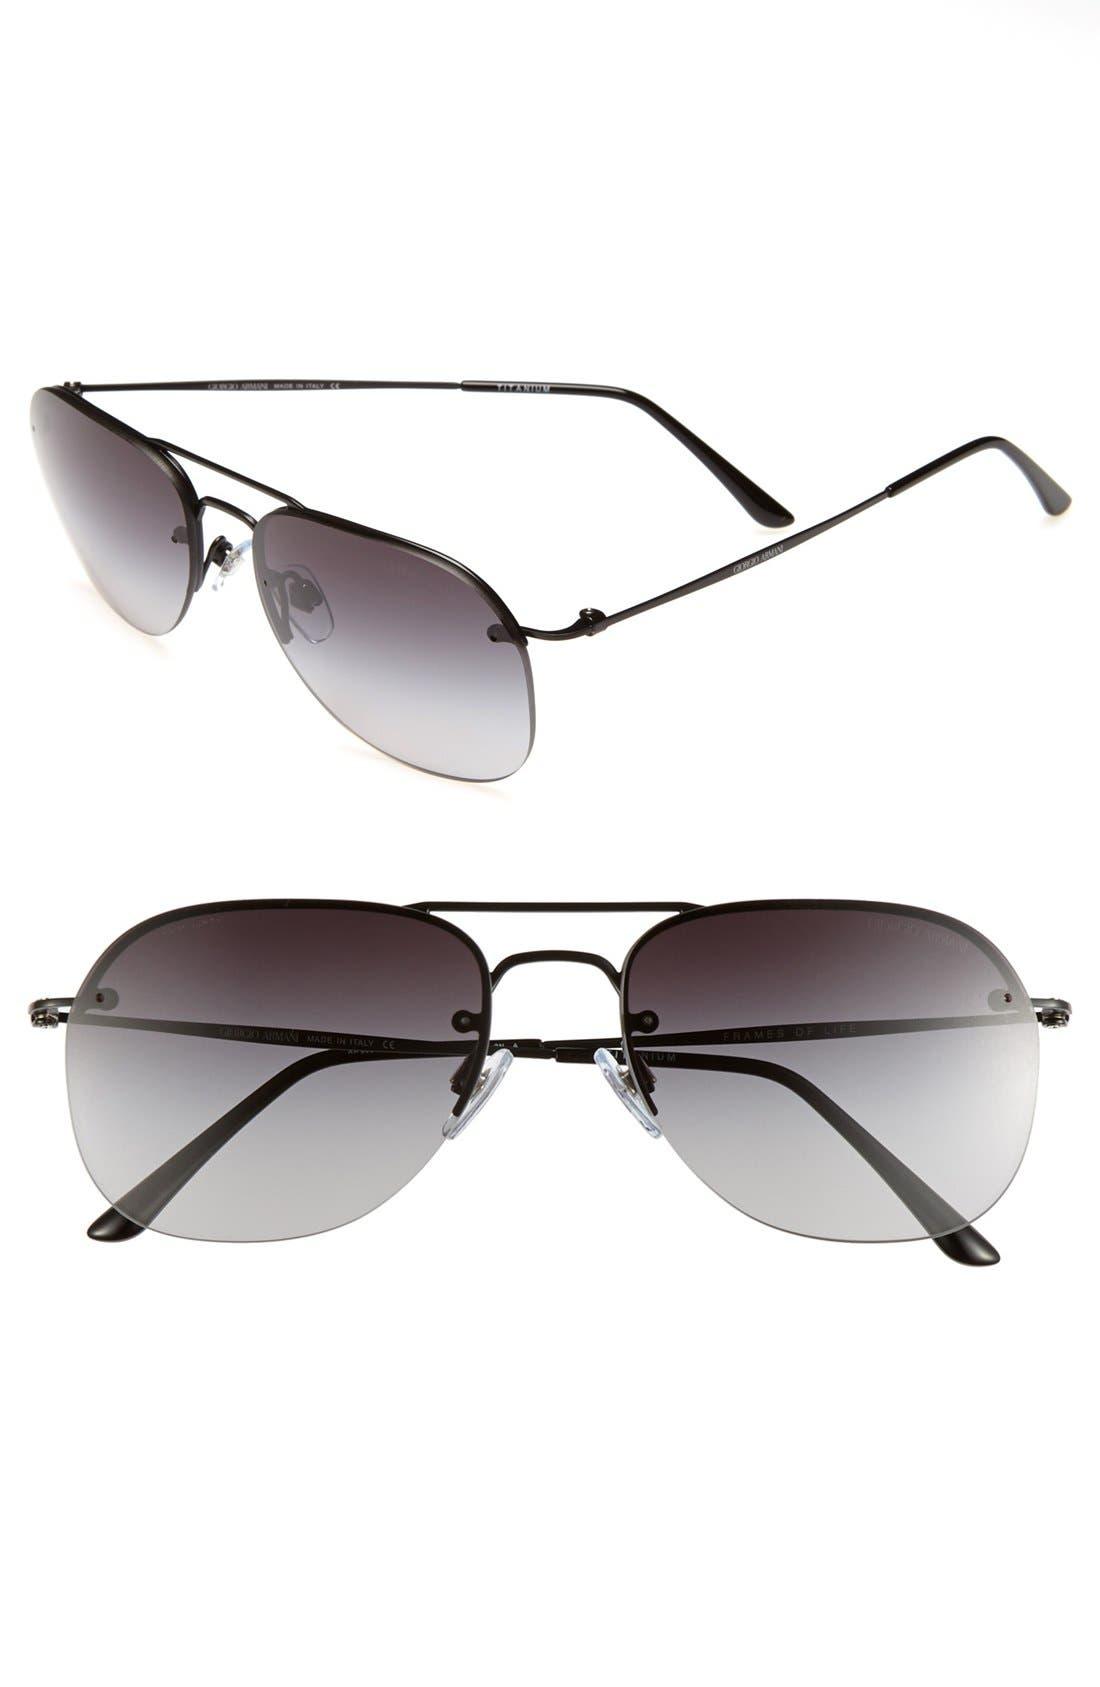 Alternate Image 1 Selected - Giorgio Armani 55mm Aviator Sunglasses